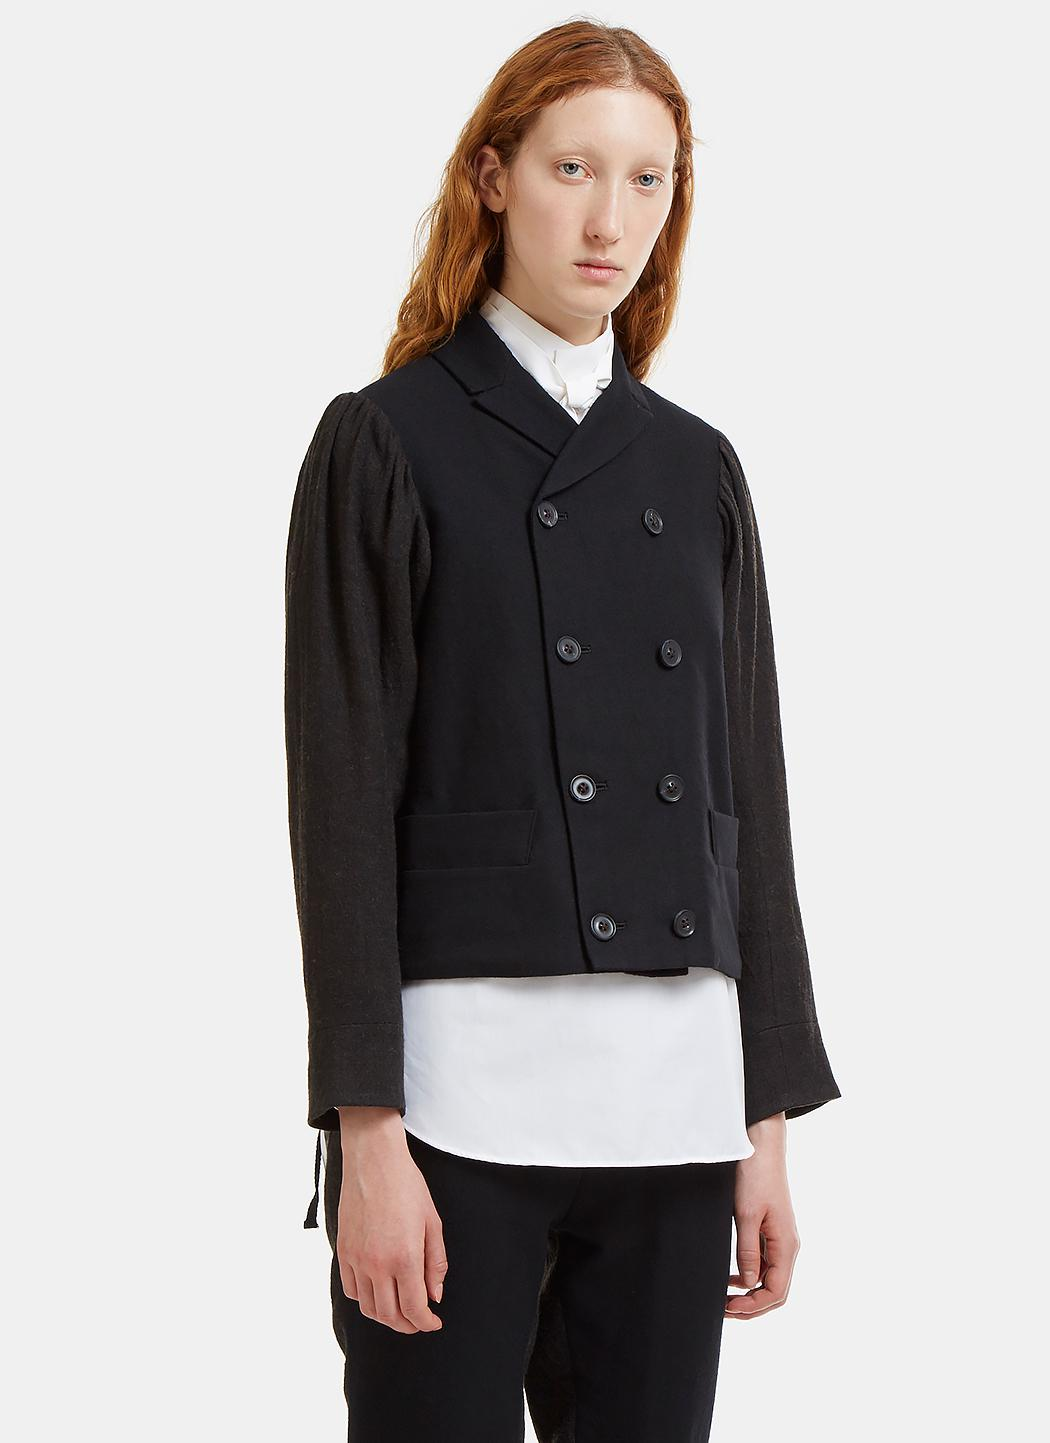 John Double-Breasted Contrast Blazer Jacket École de Curiosités TOsh2sM